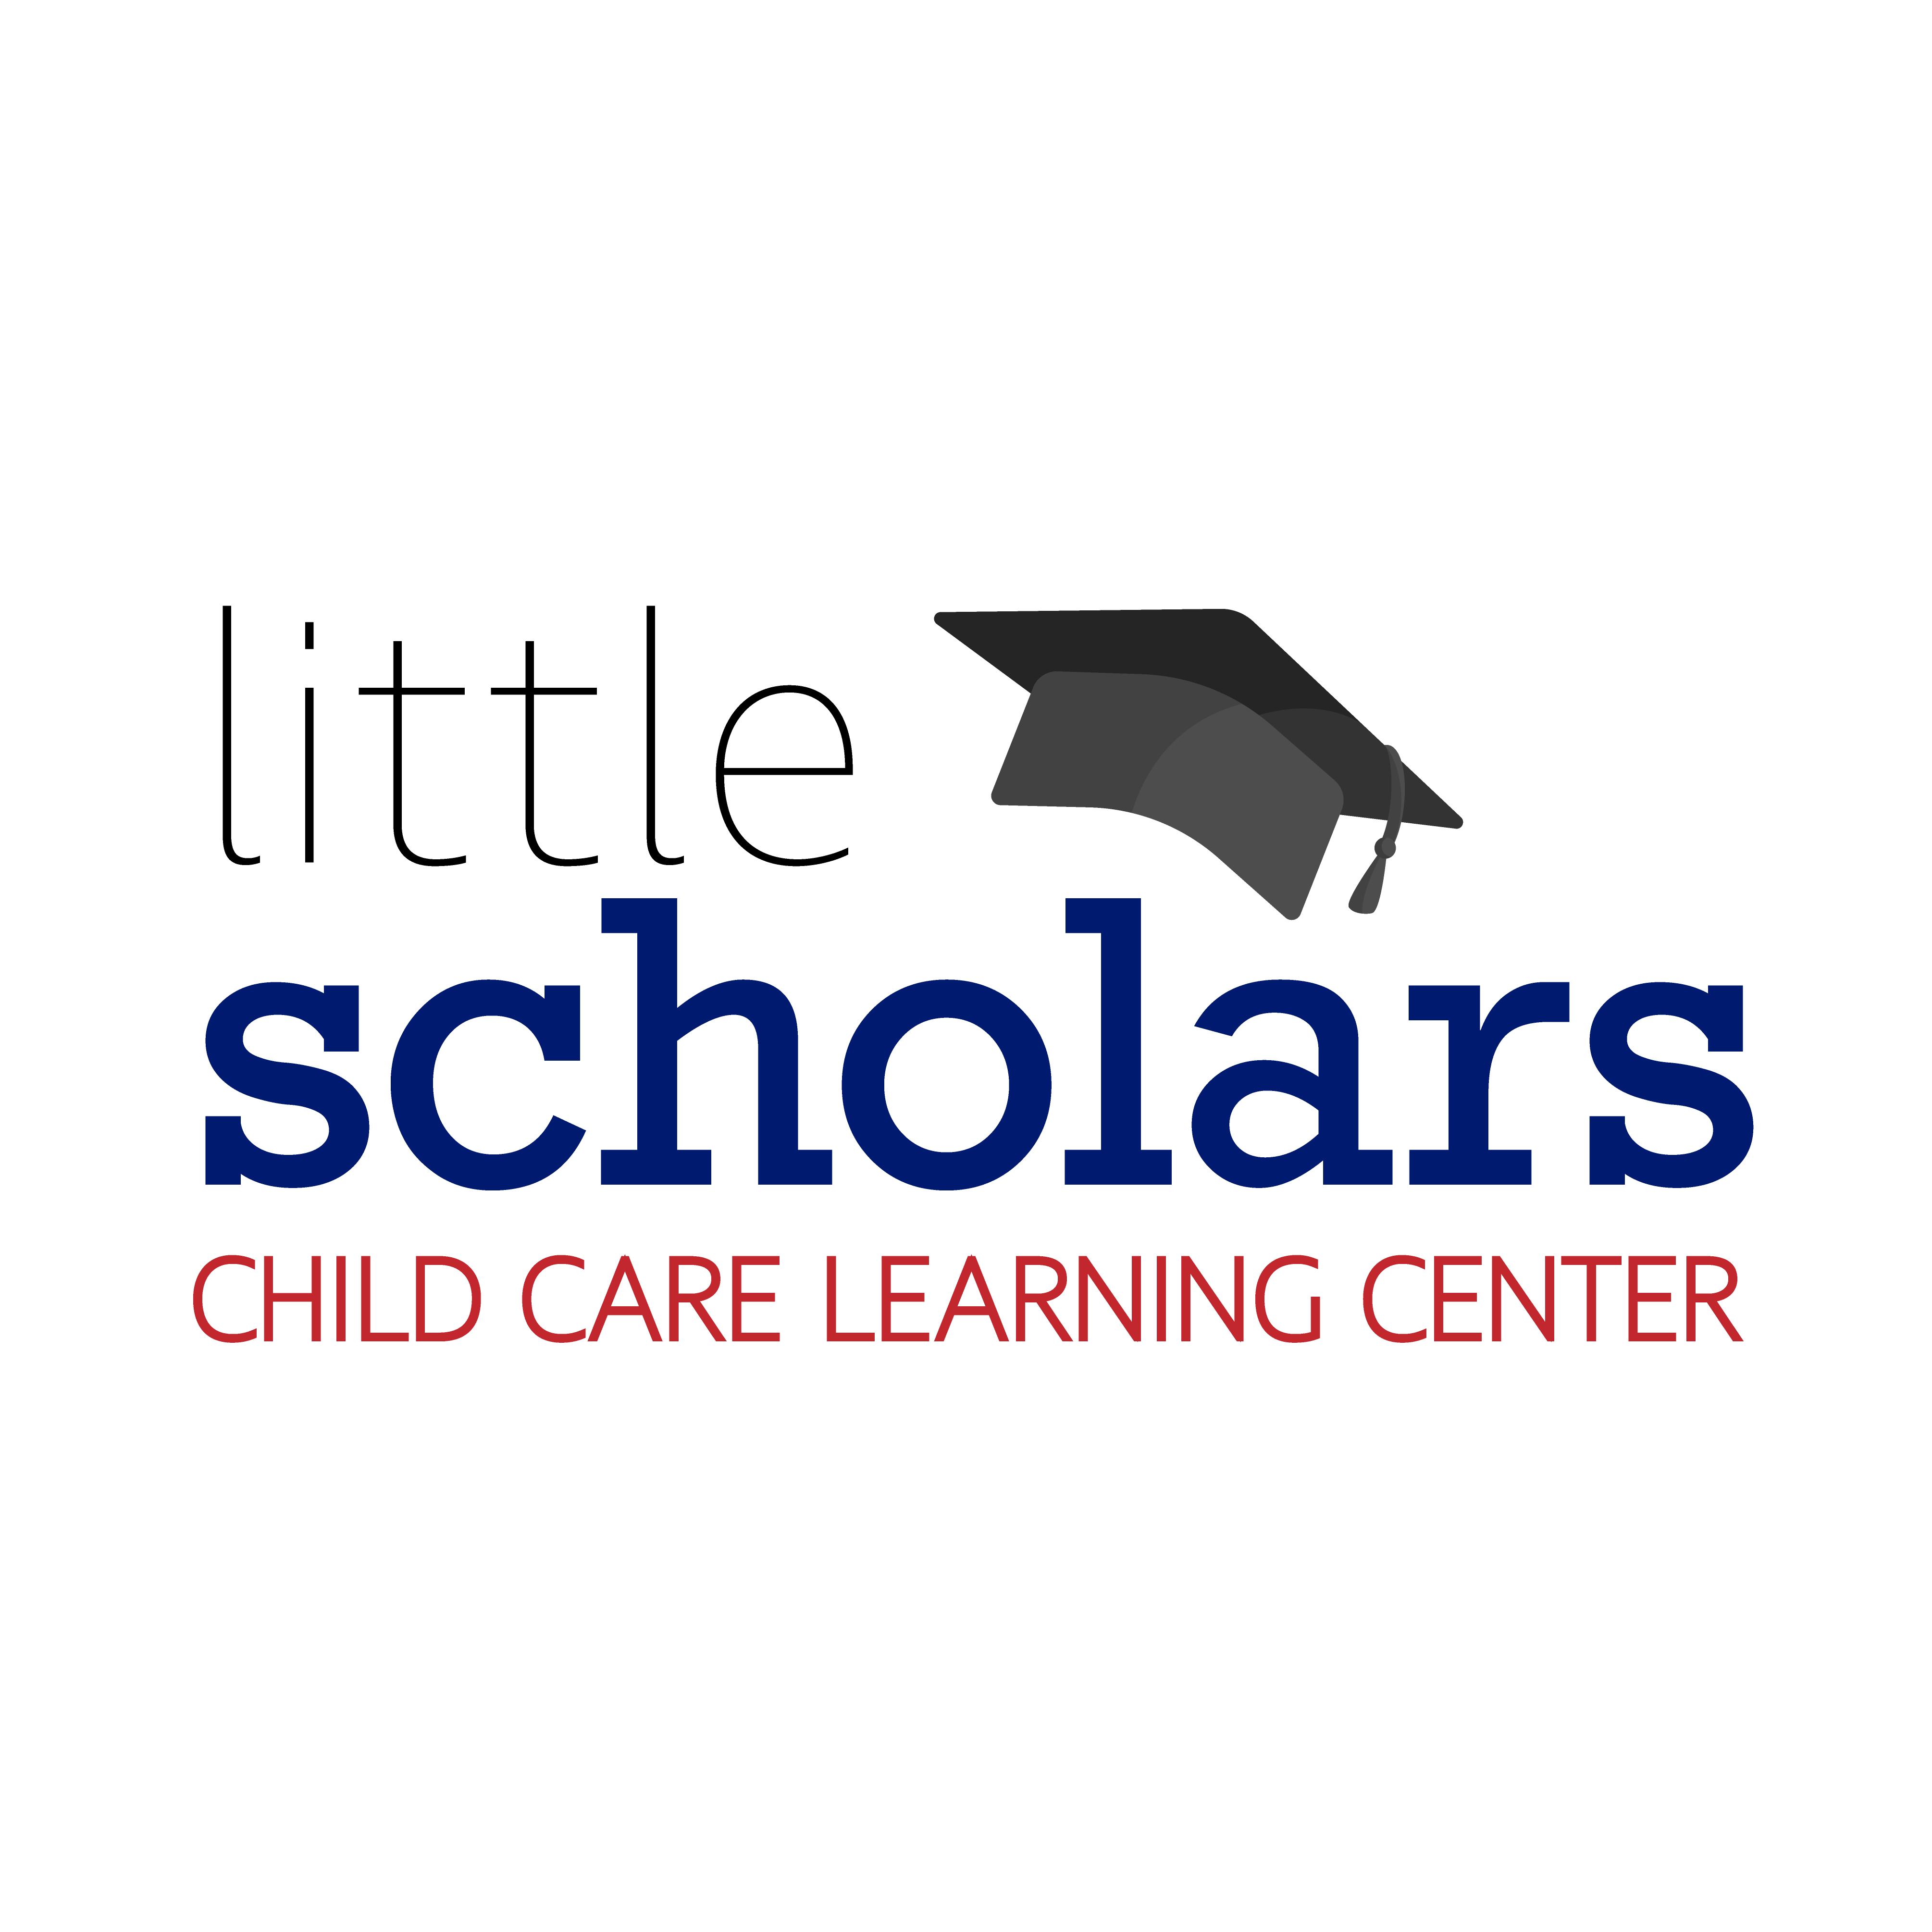 Little Scholars Child Care Learning Center